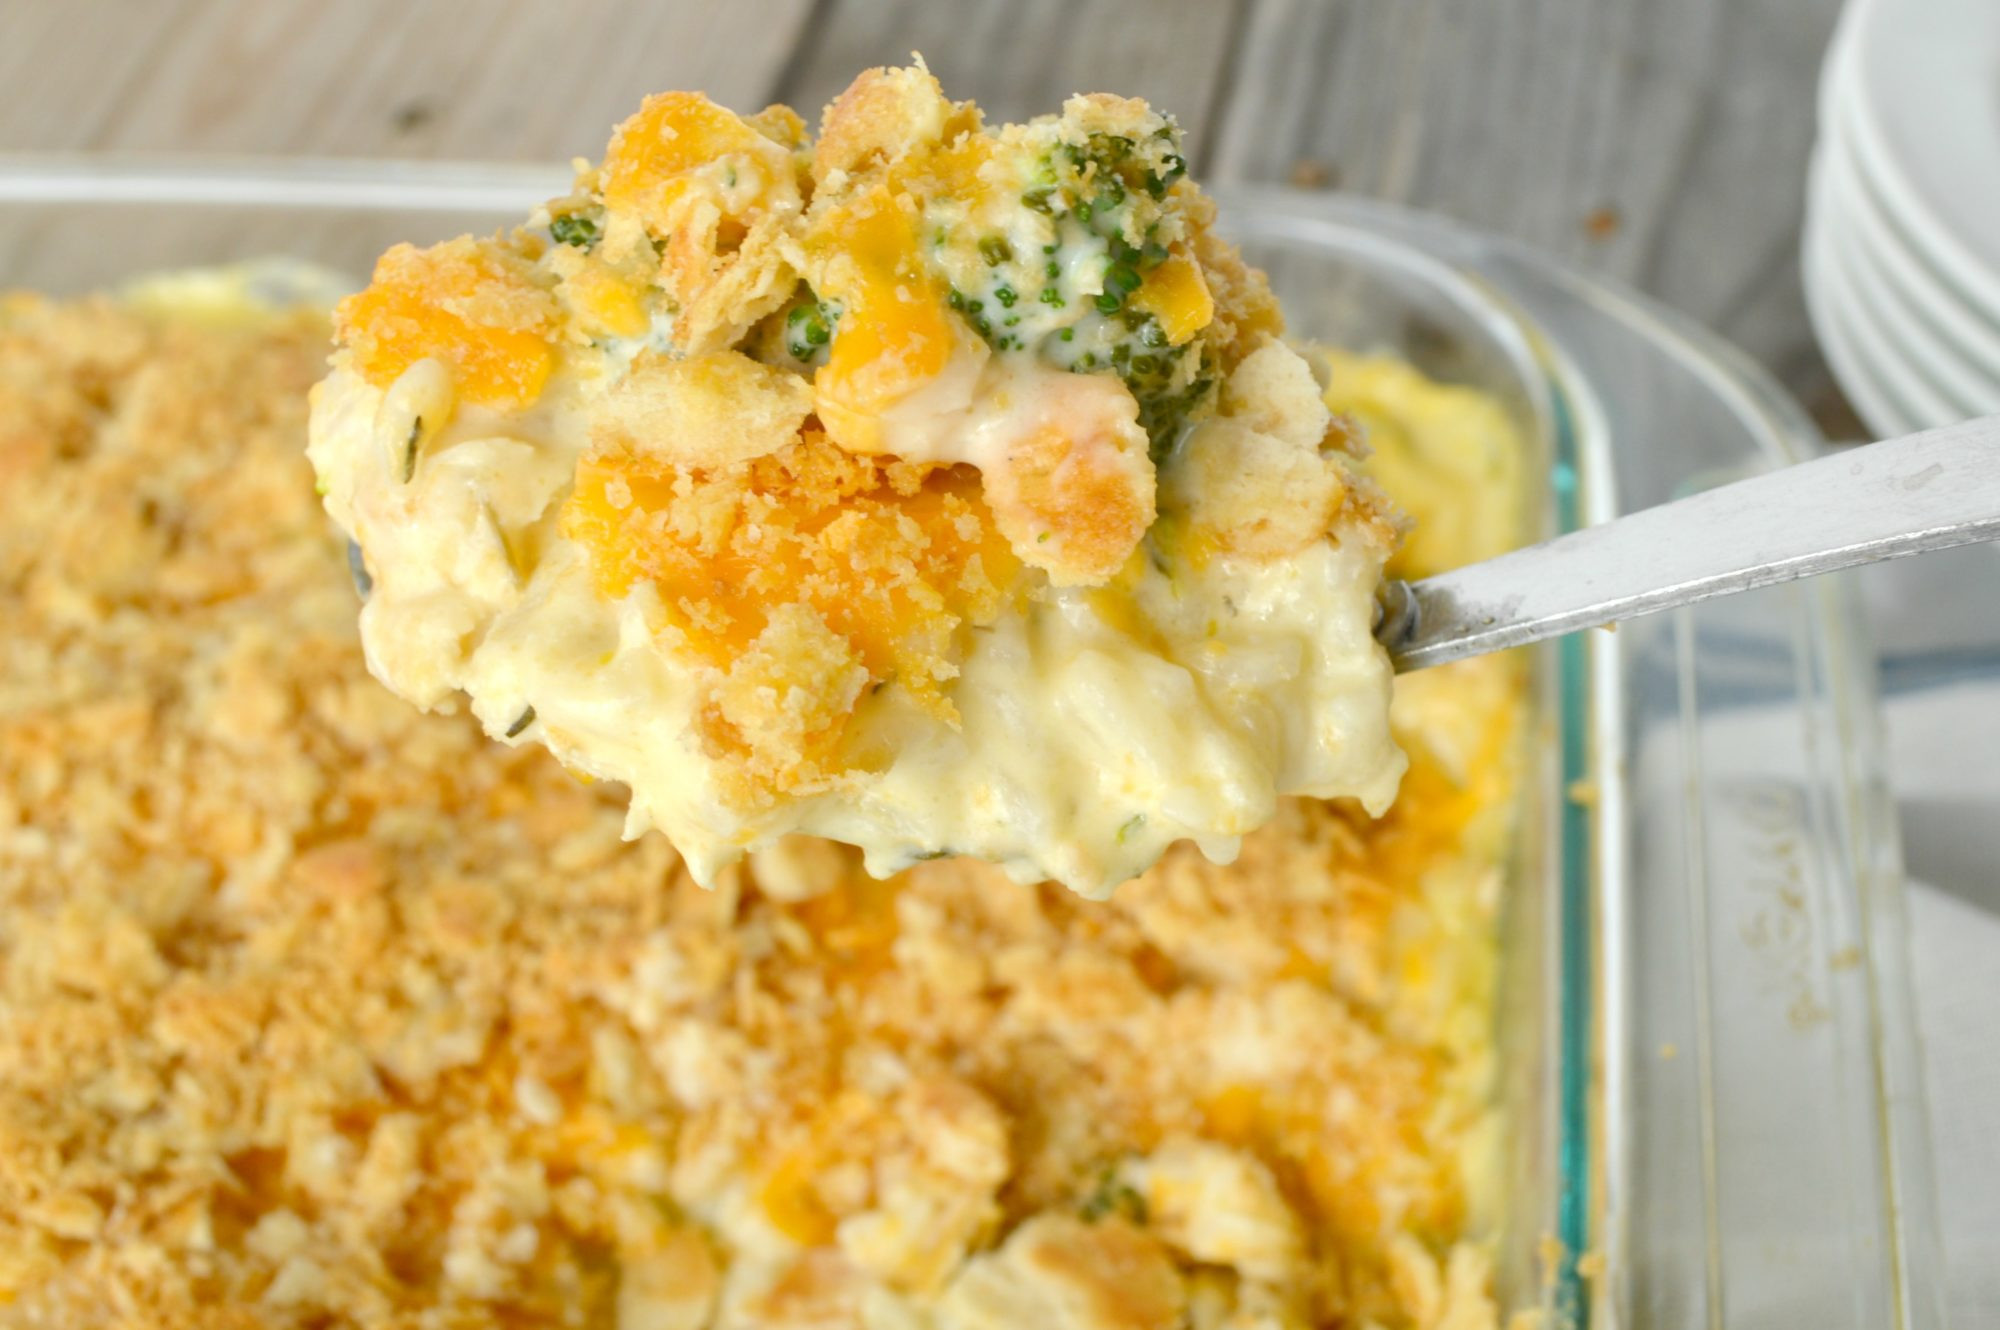 Chicken Broccoli Casserole Recipe  Chicken Broccoli Rice Casserole Easy fort Food Your